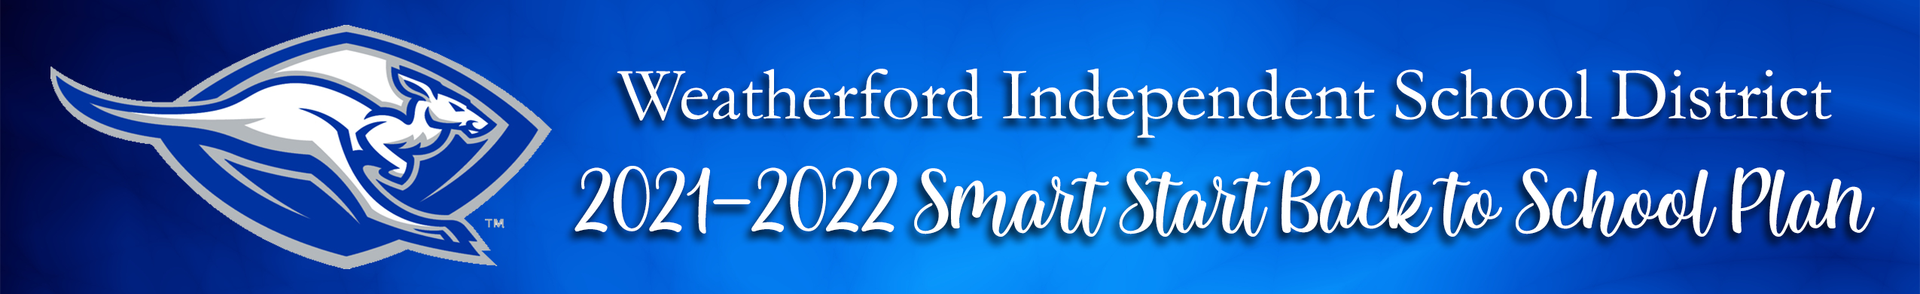 Text on blue background: Weatherford Independent School District 2021-2022 Smart Start Plan